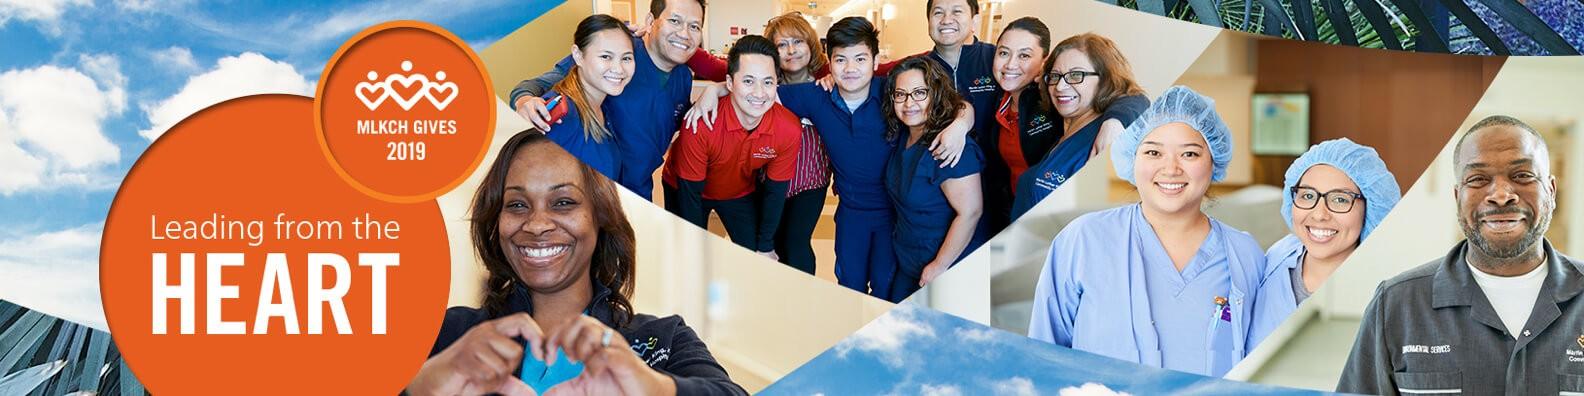 Martin Luther King, Jr  Community Hospital | LinkedIn